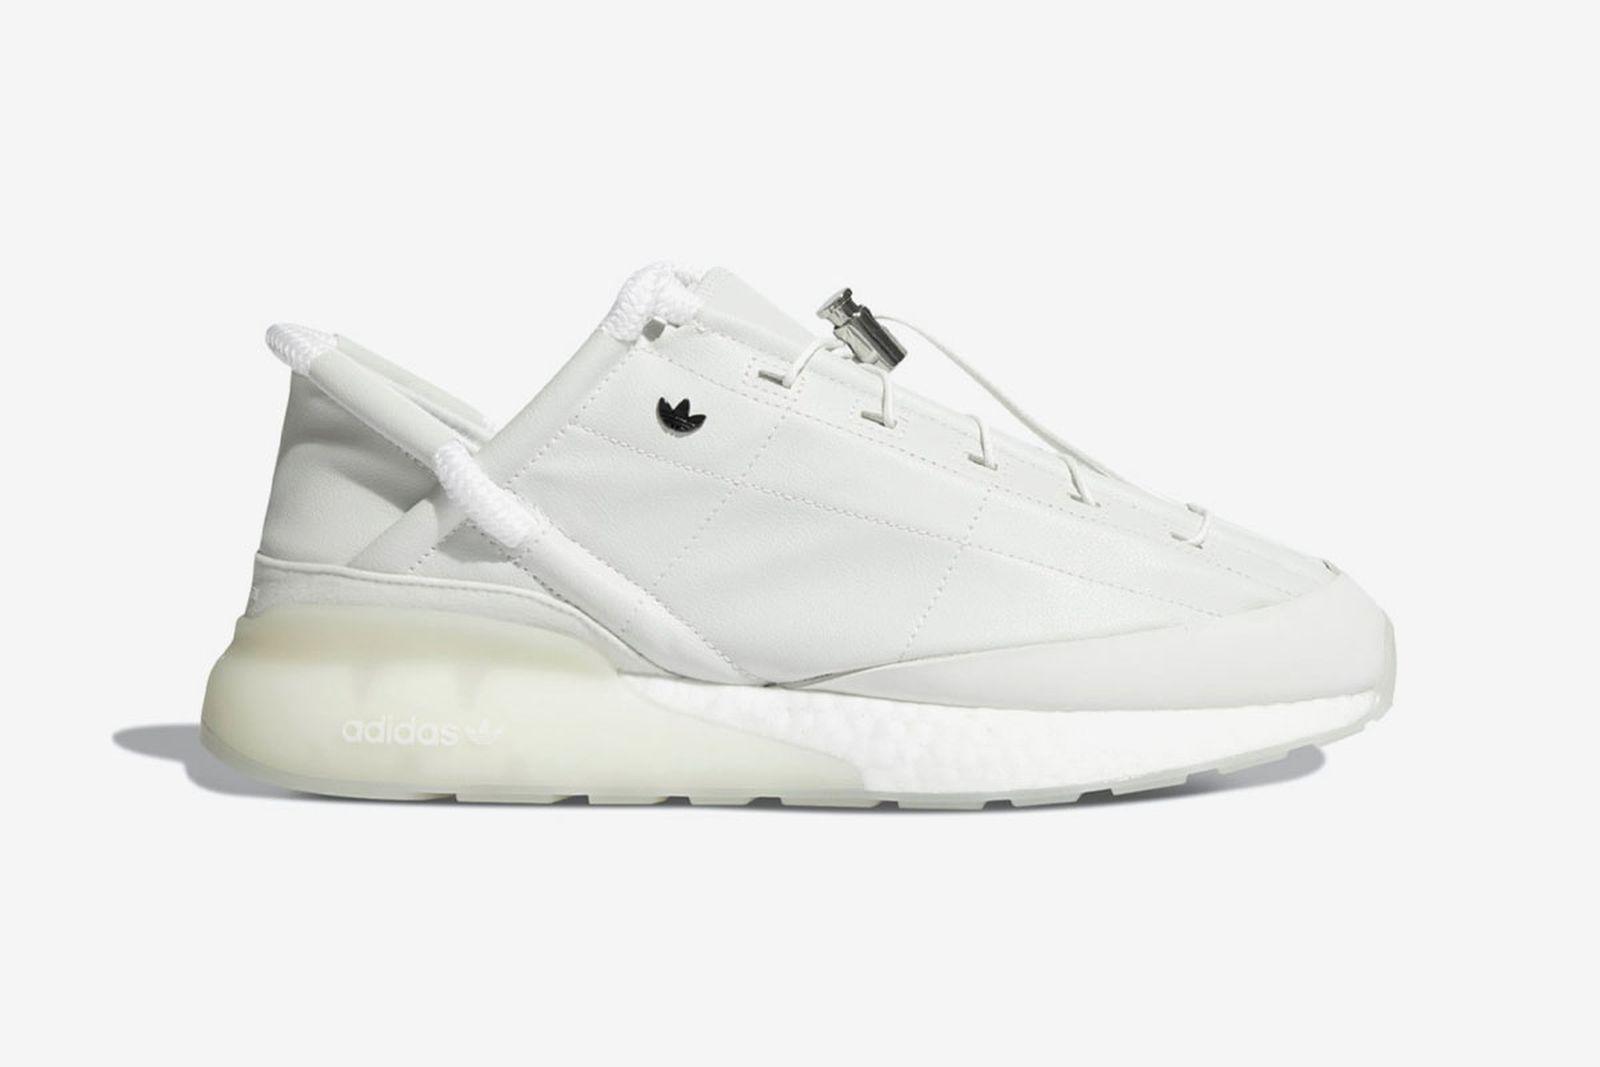 craig-green-adidas-zx-2k-phormar-ii-release-date-price-07